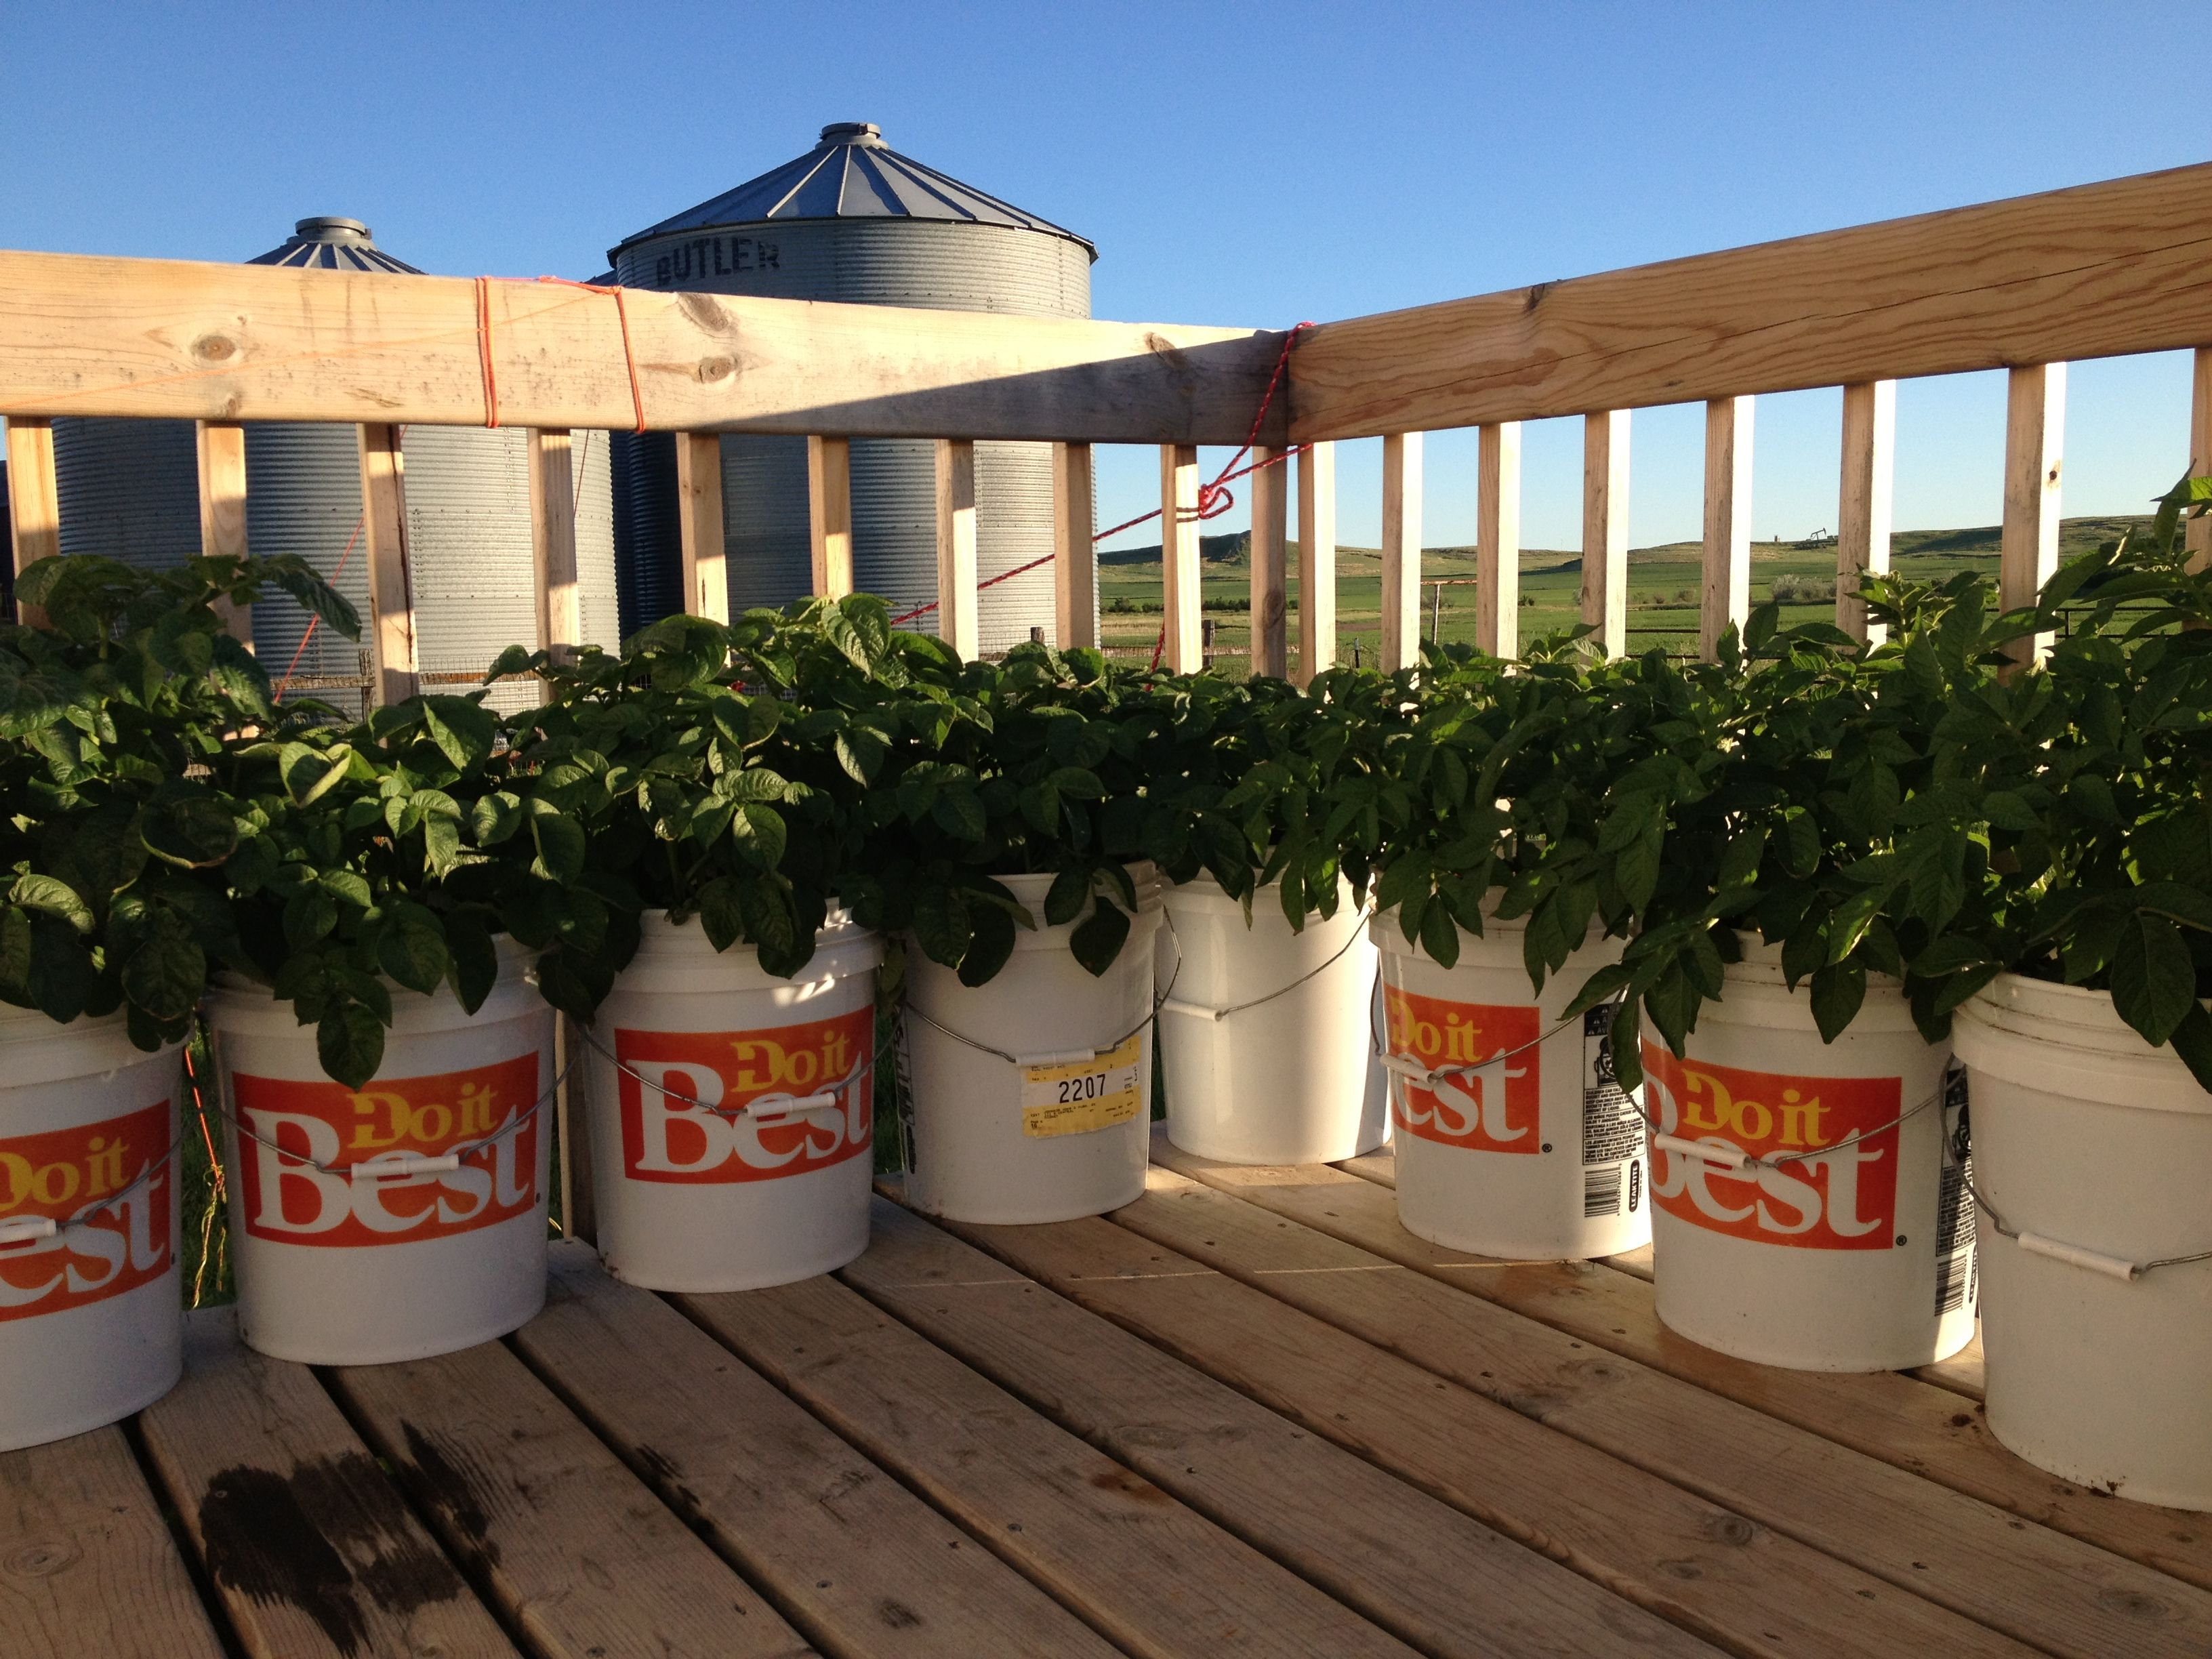 5 gallon bucket potatoes